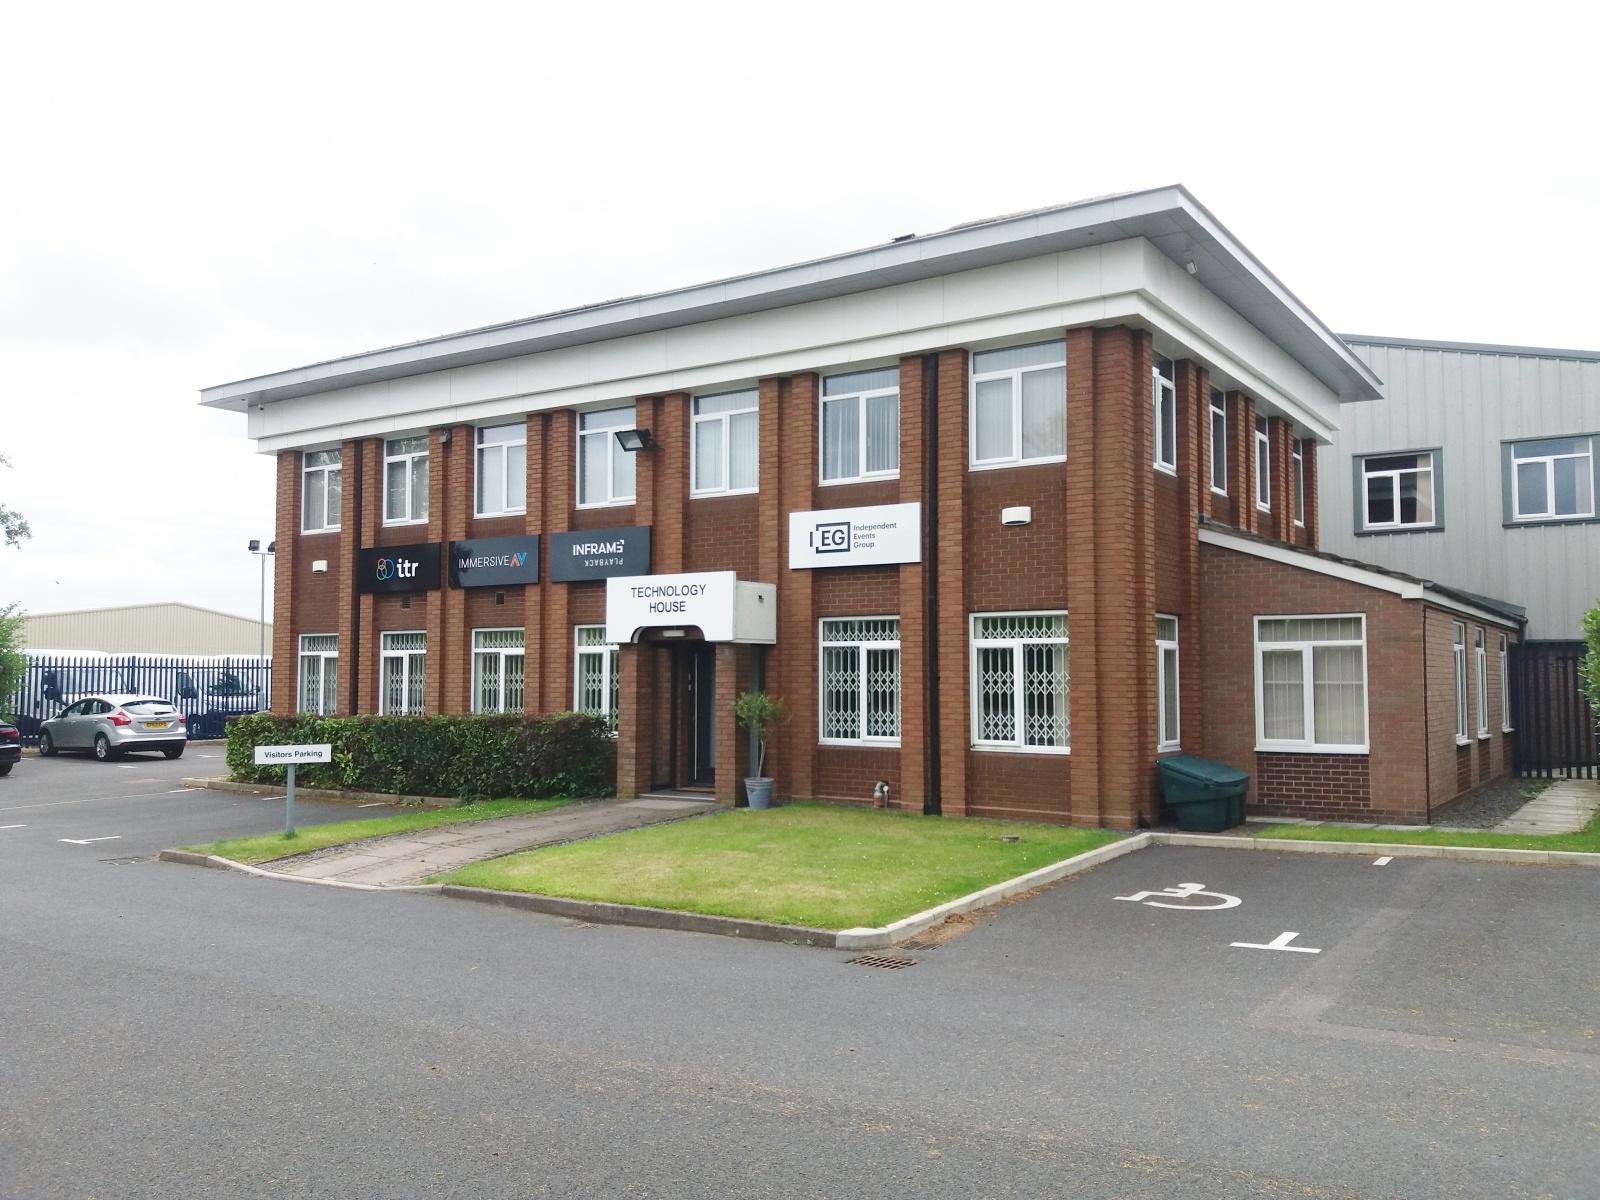 Technology House, Halesfield 7, Telford, Shropshire